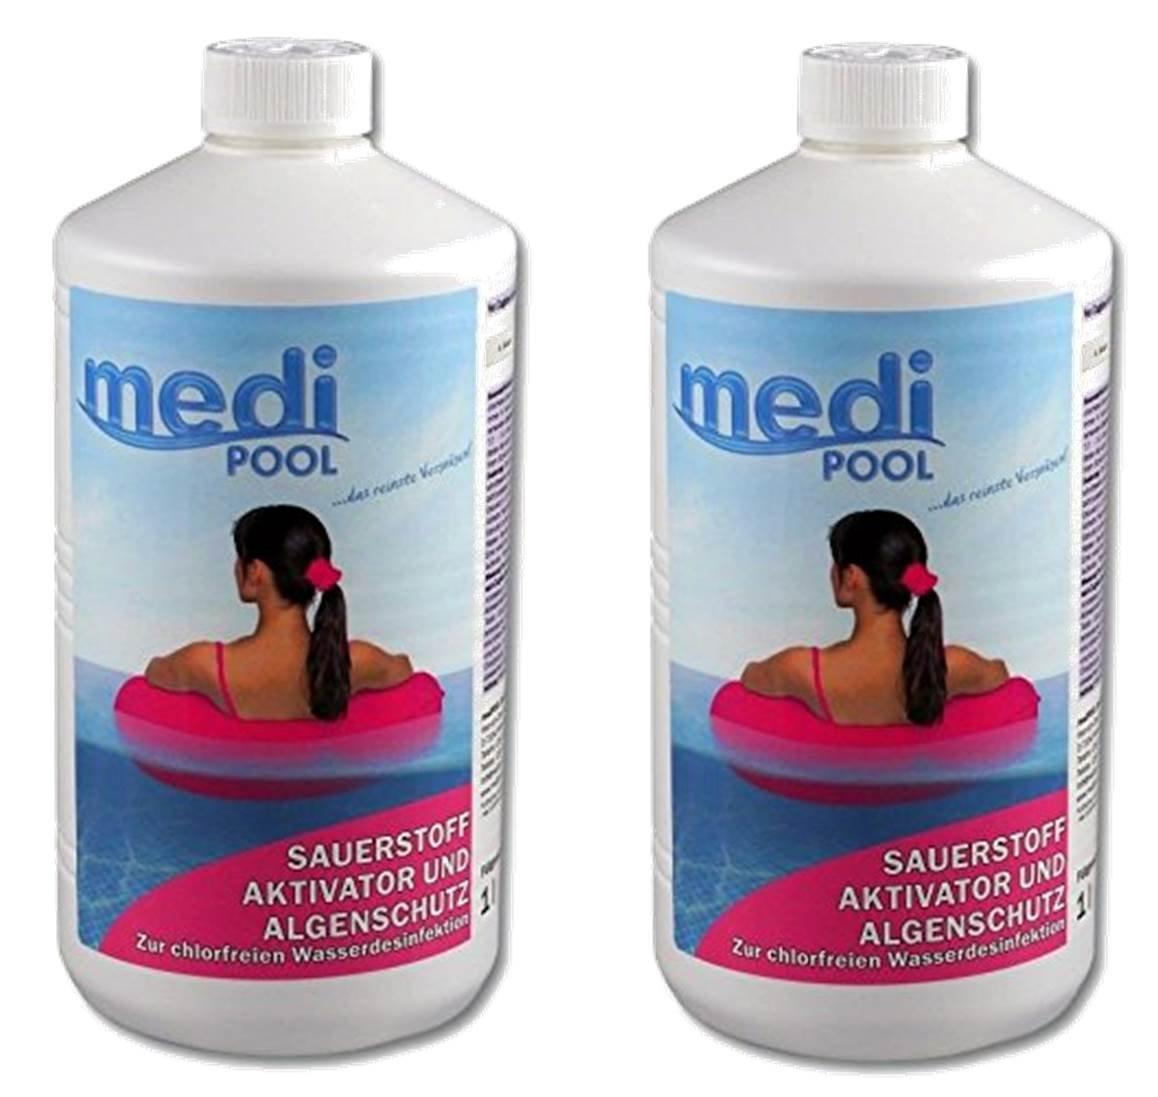 mediPOOL 608601MP Sauerstoff Aktivator, 2 x 1 Liter